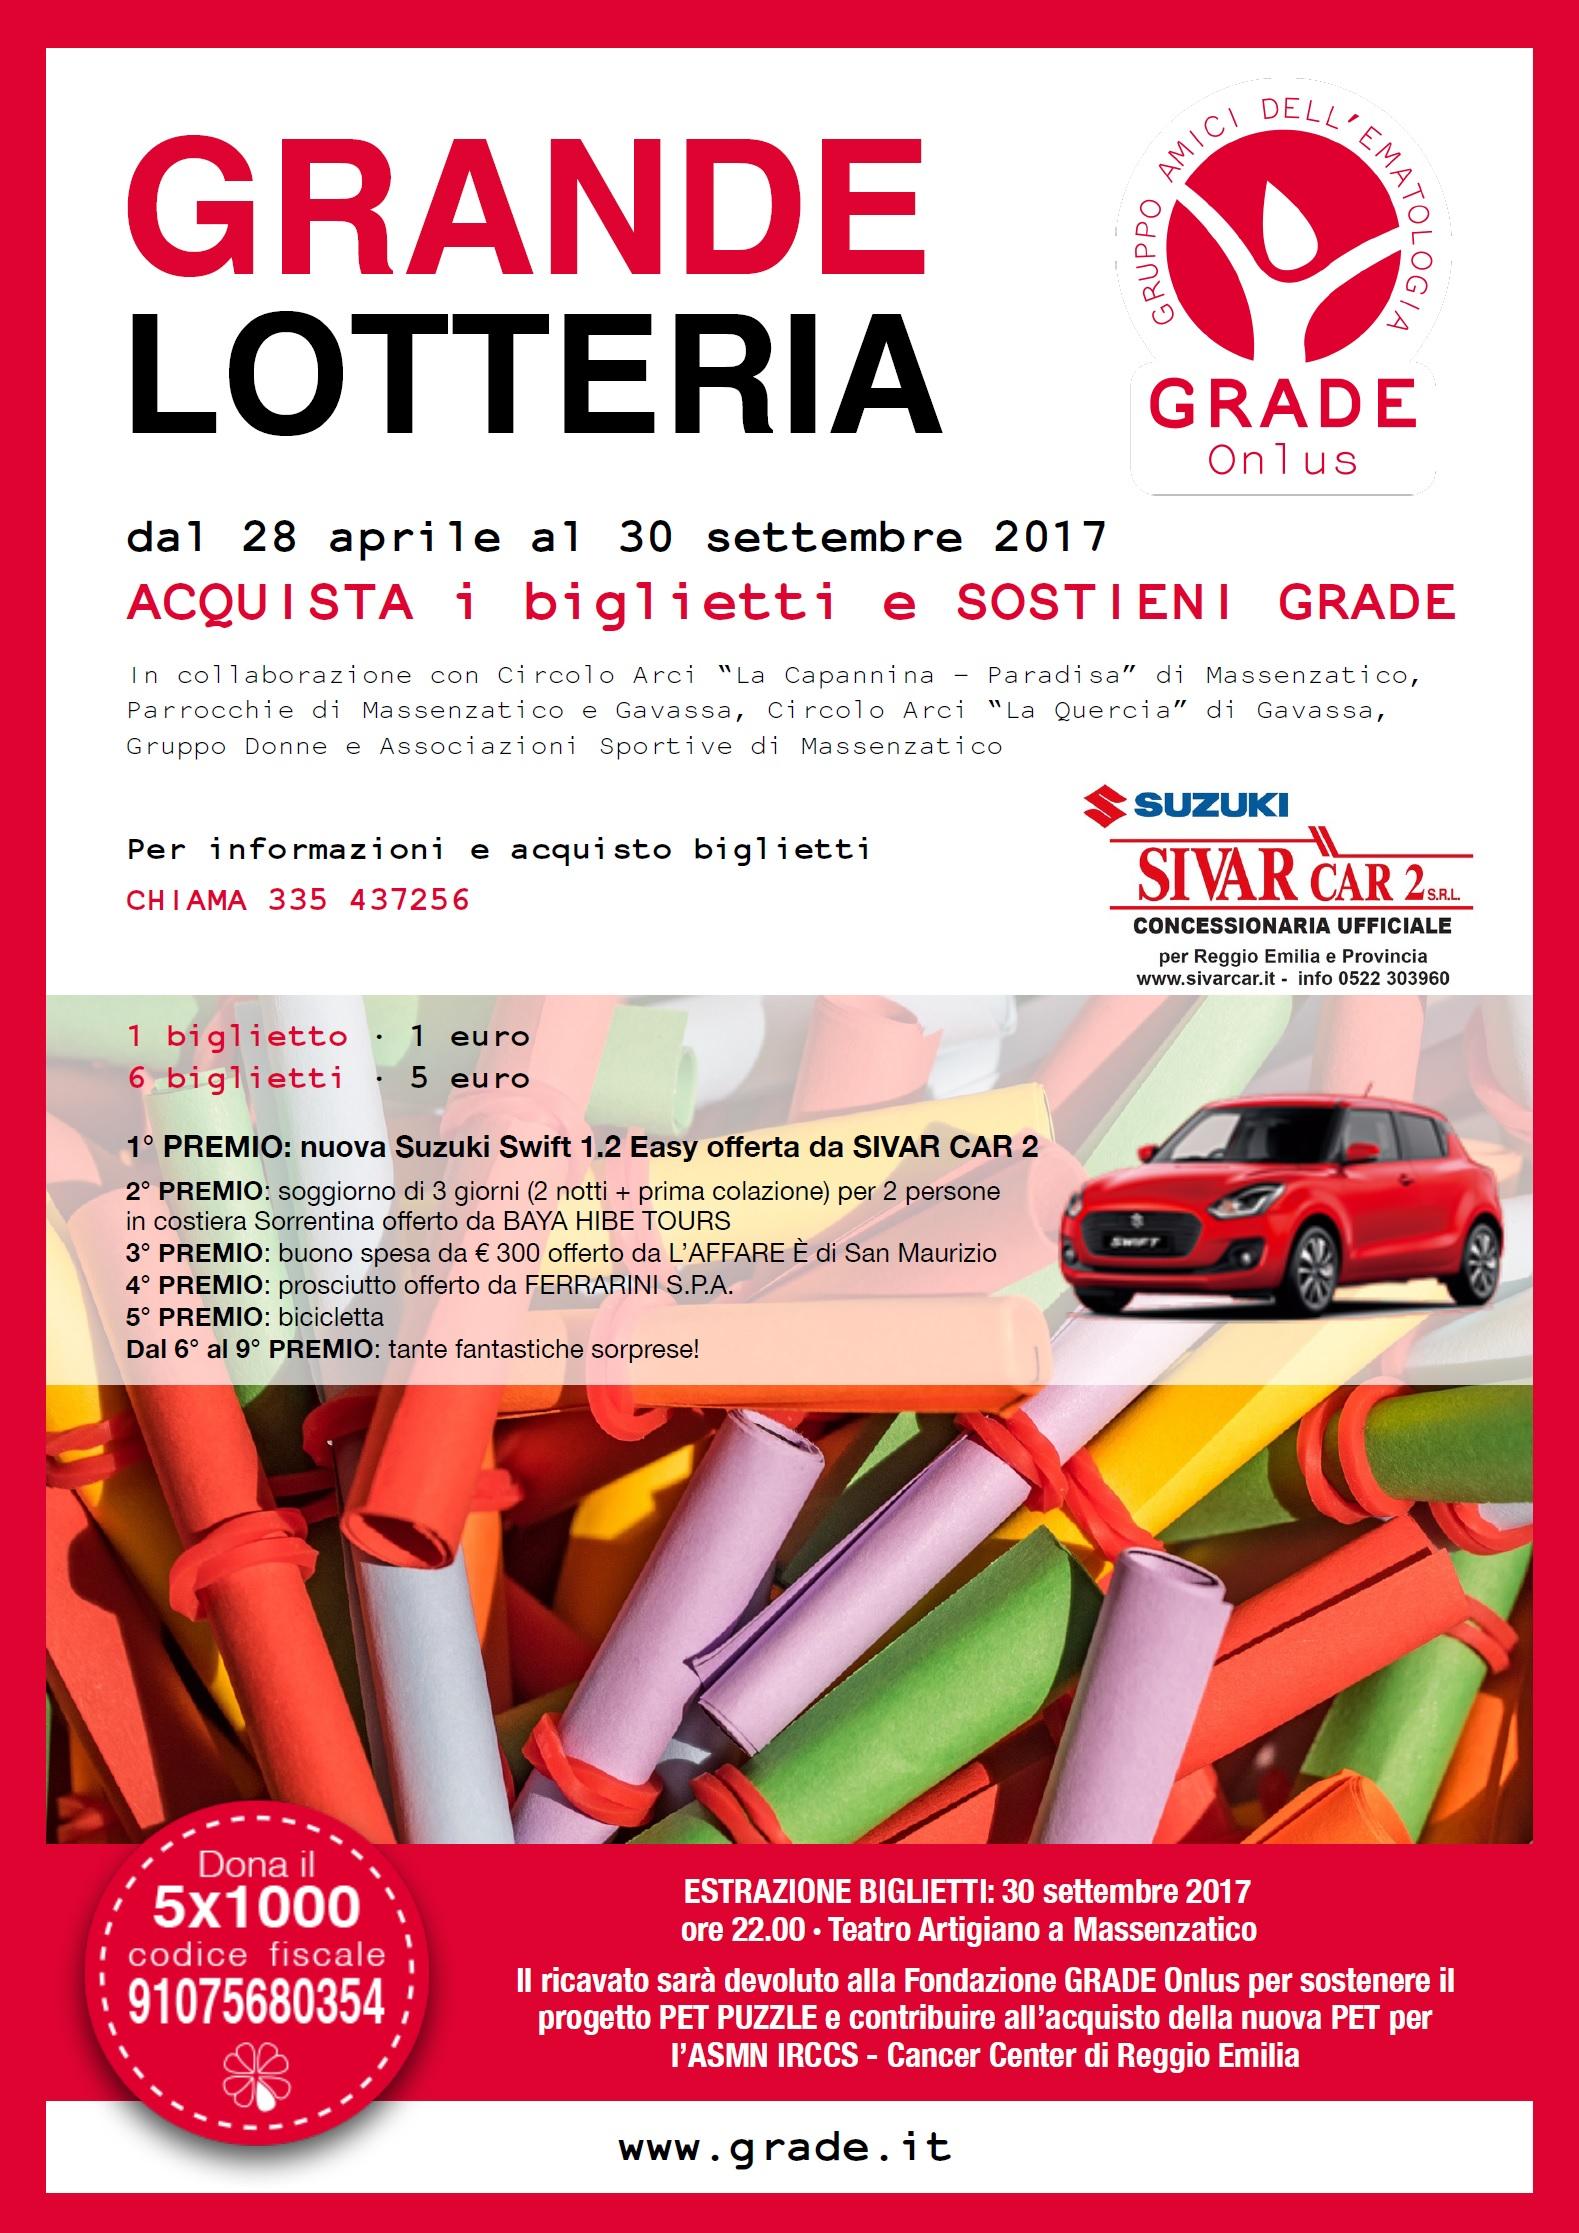 londandina lotteria